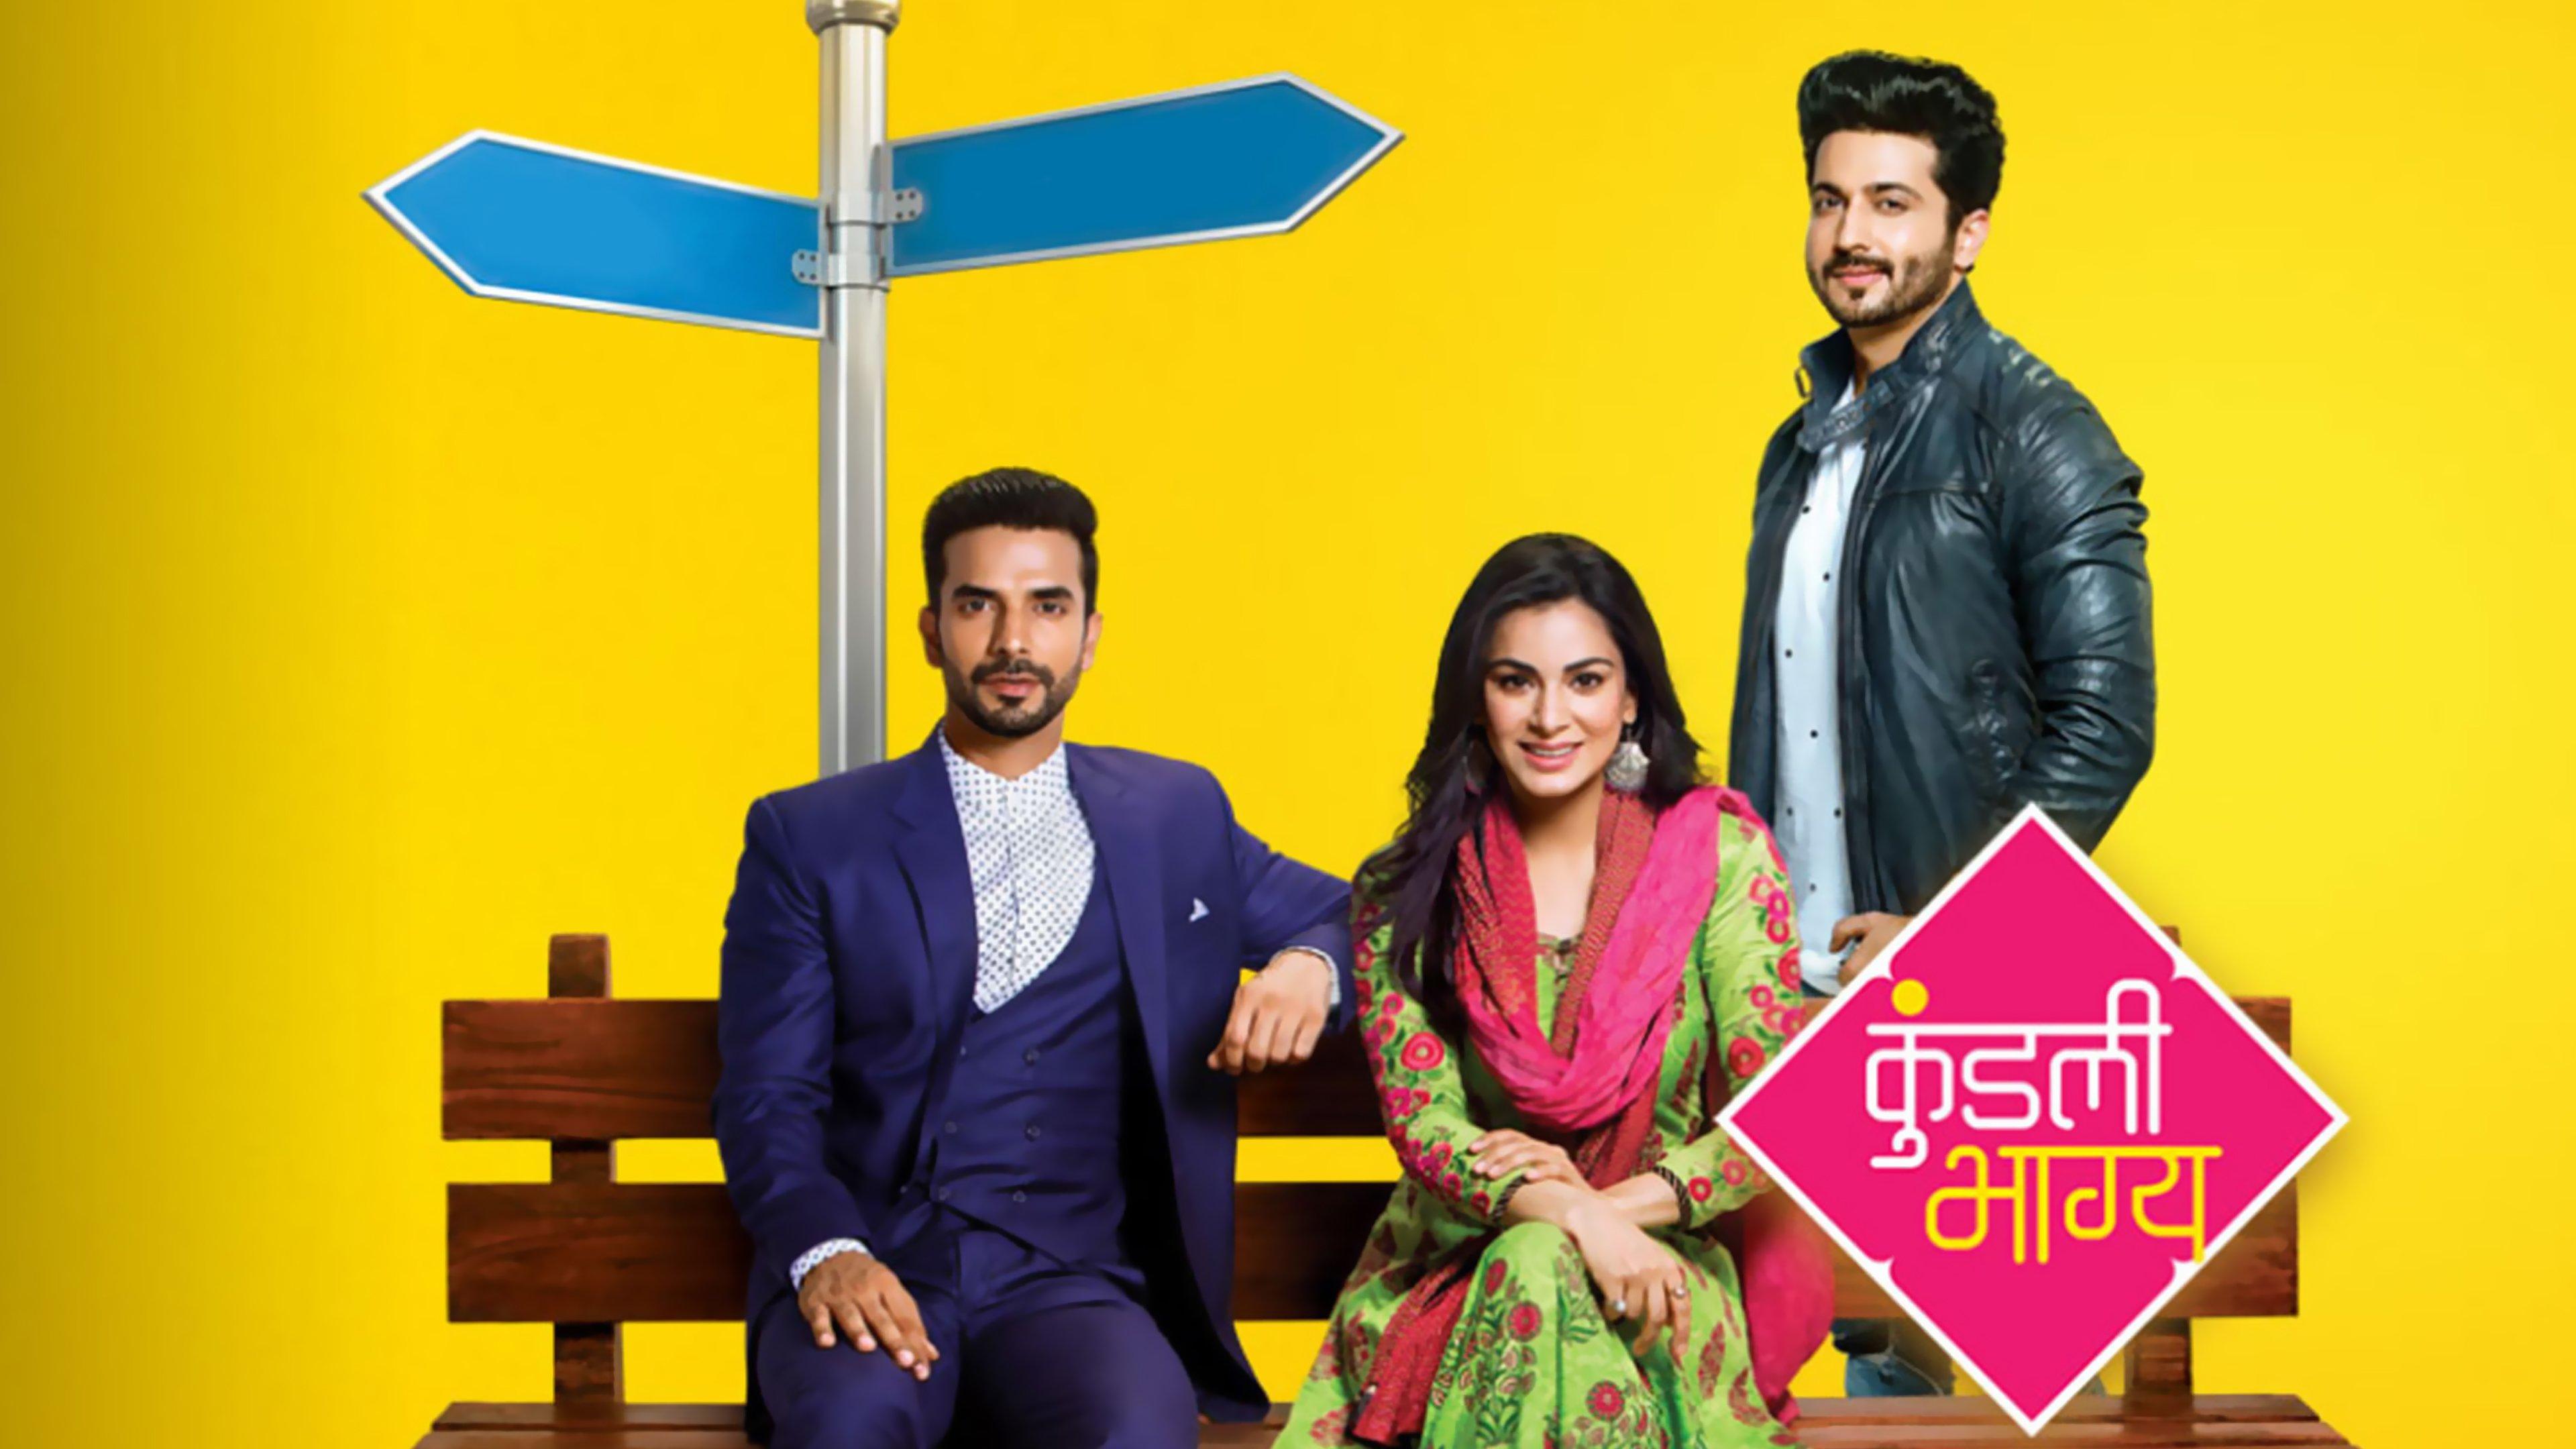 Watch Kundali Bhagya Zee TV HD Full HD Episodes Online- Airtel Xstream  (Airtel TV)